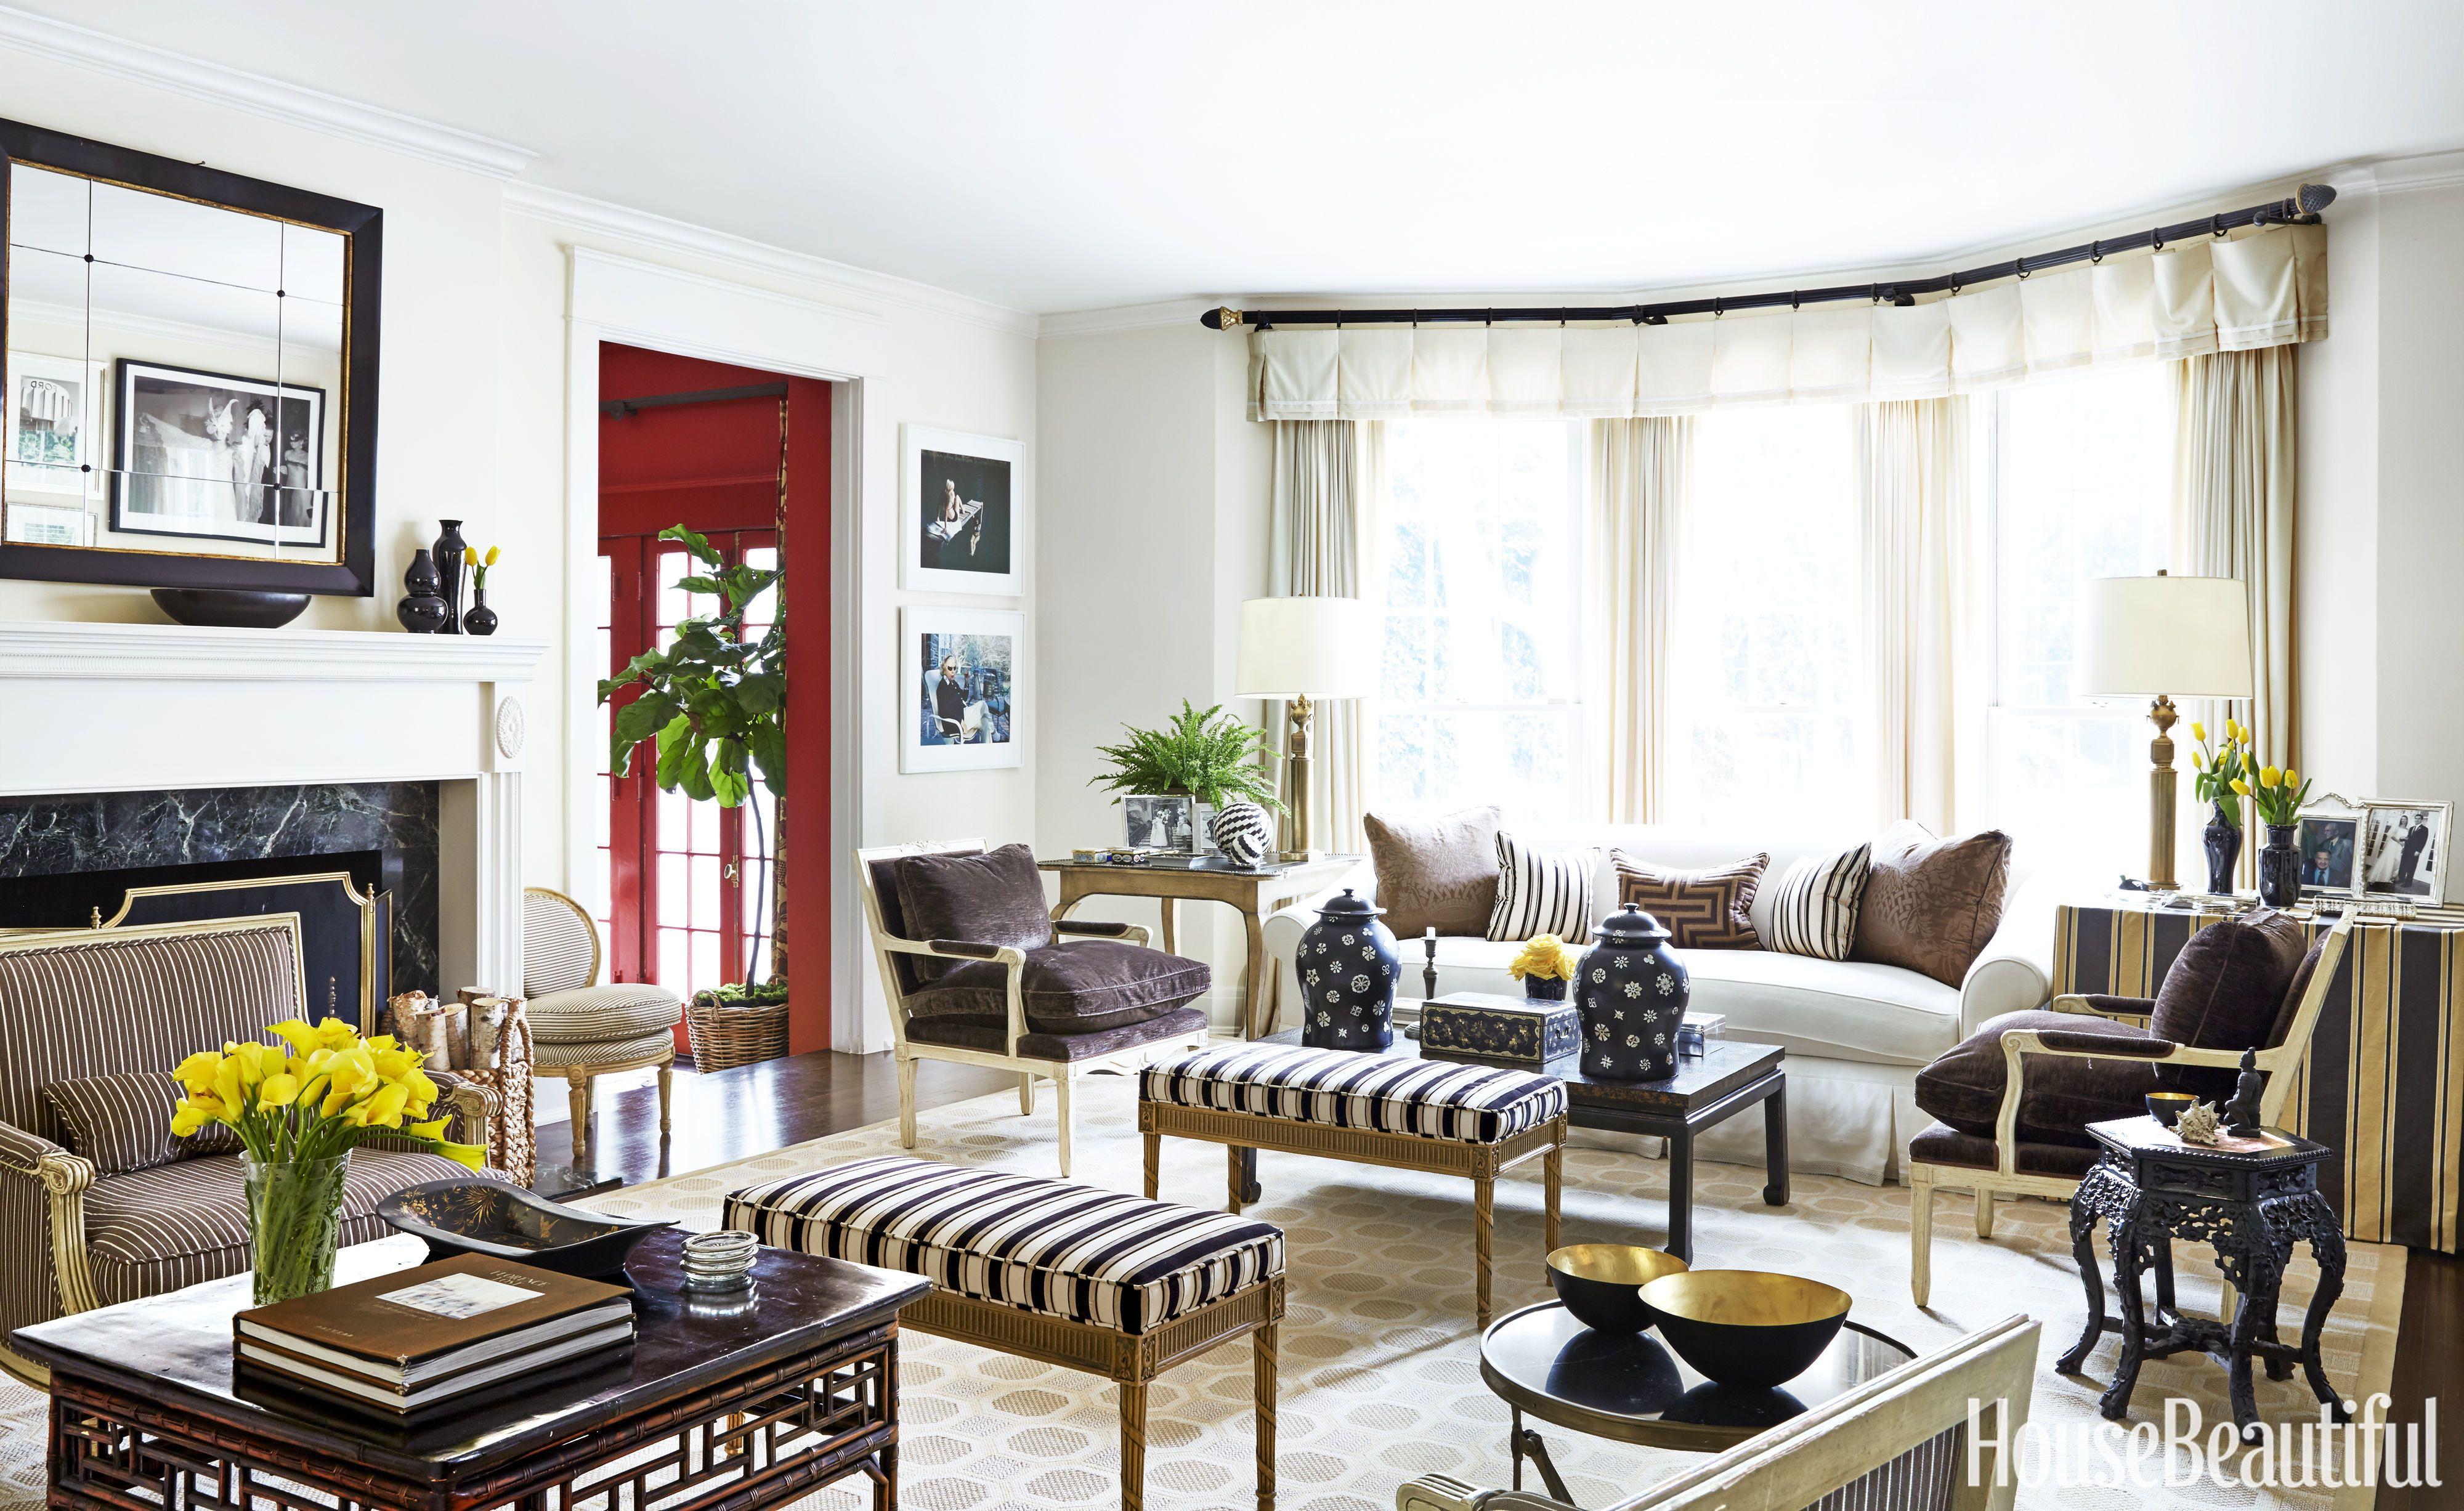 mary mcdonald georgian revival interior design rh housebeautiful com mary mcdonald interior designer instagram mary mcdonald interior design